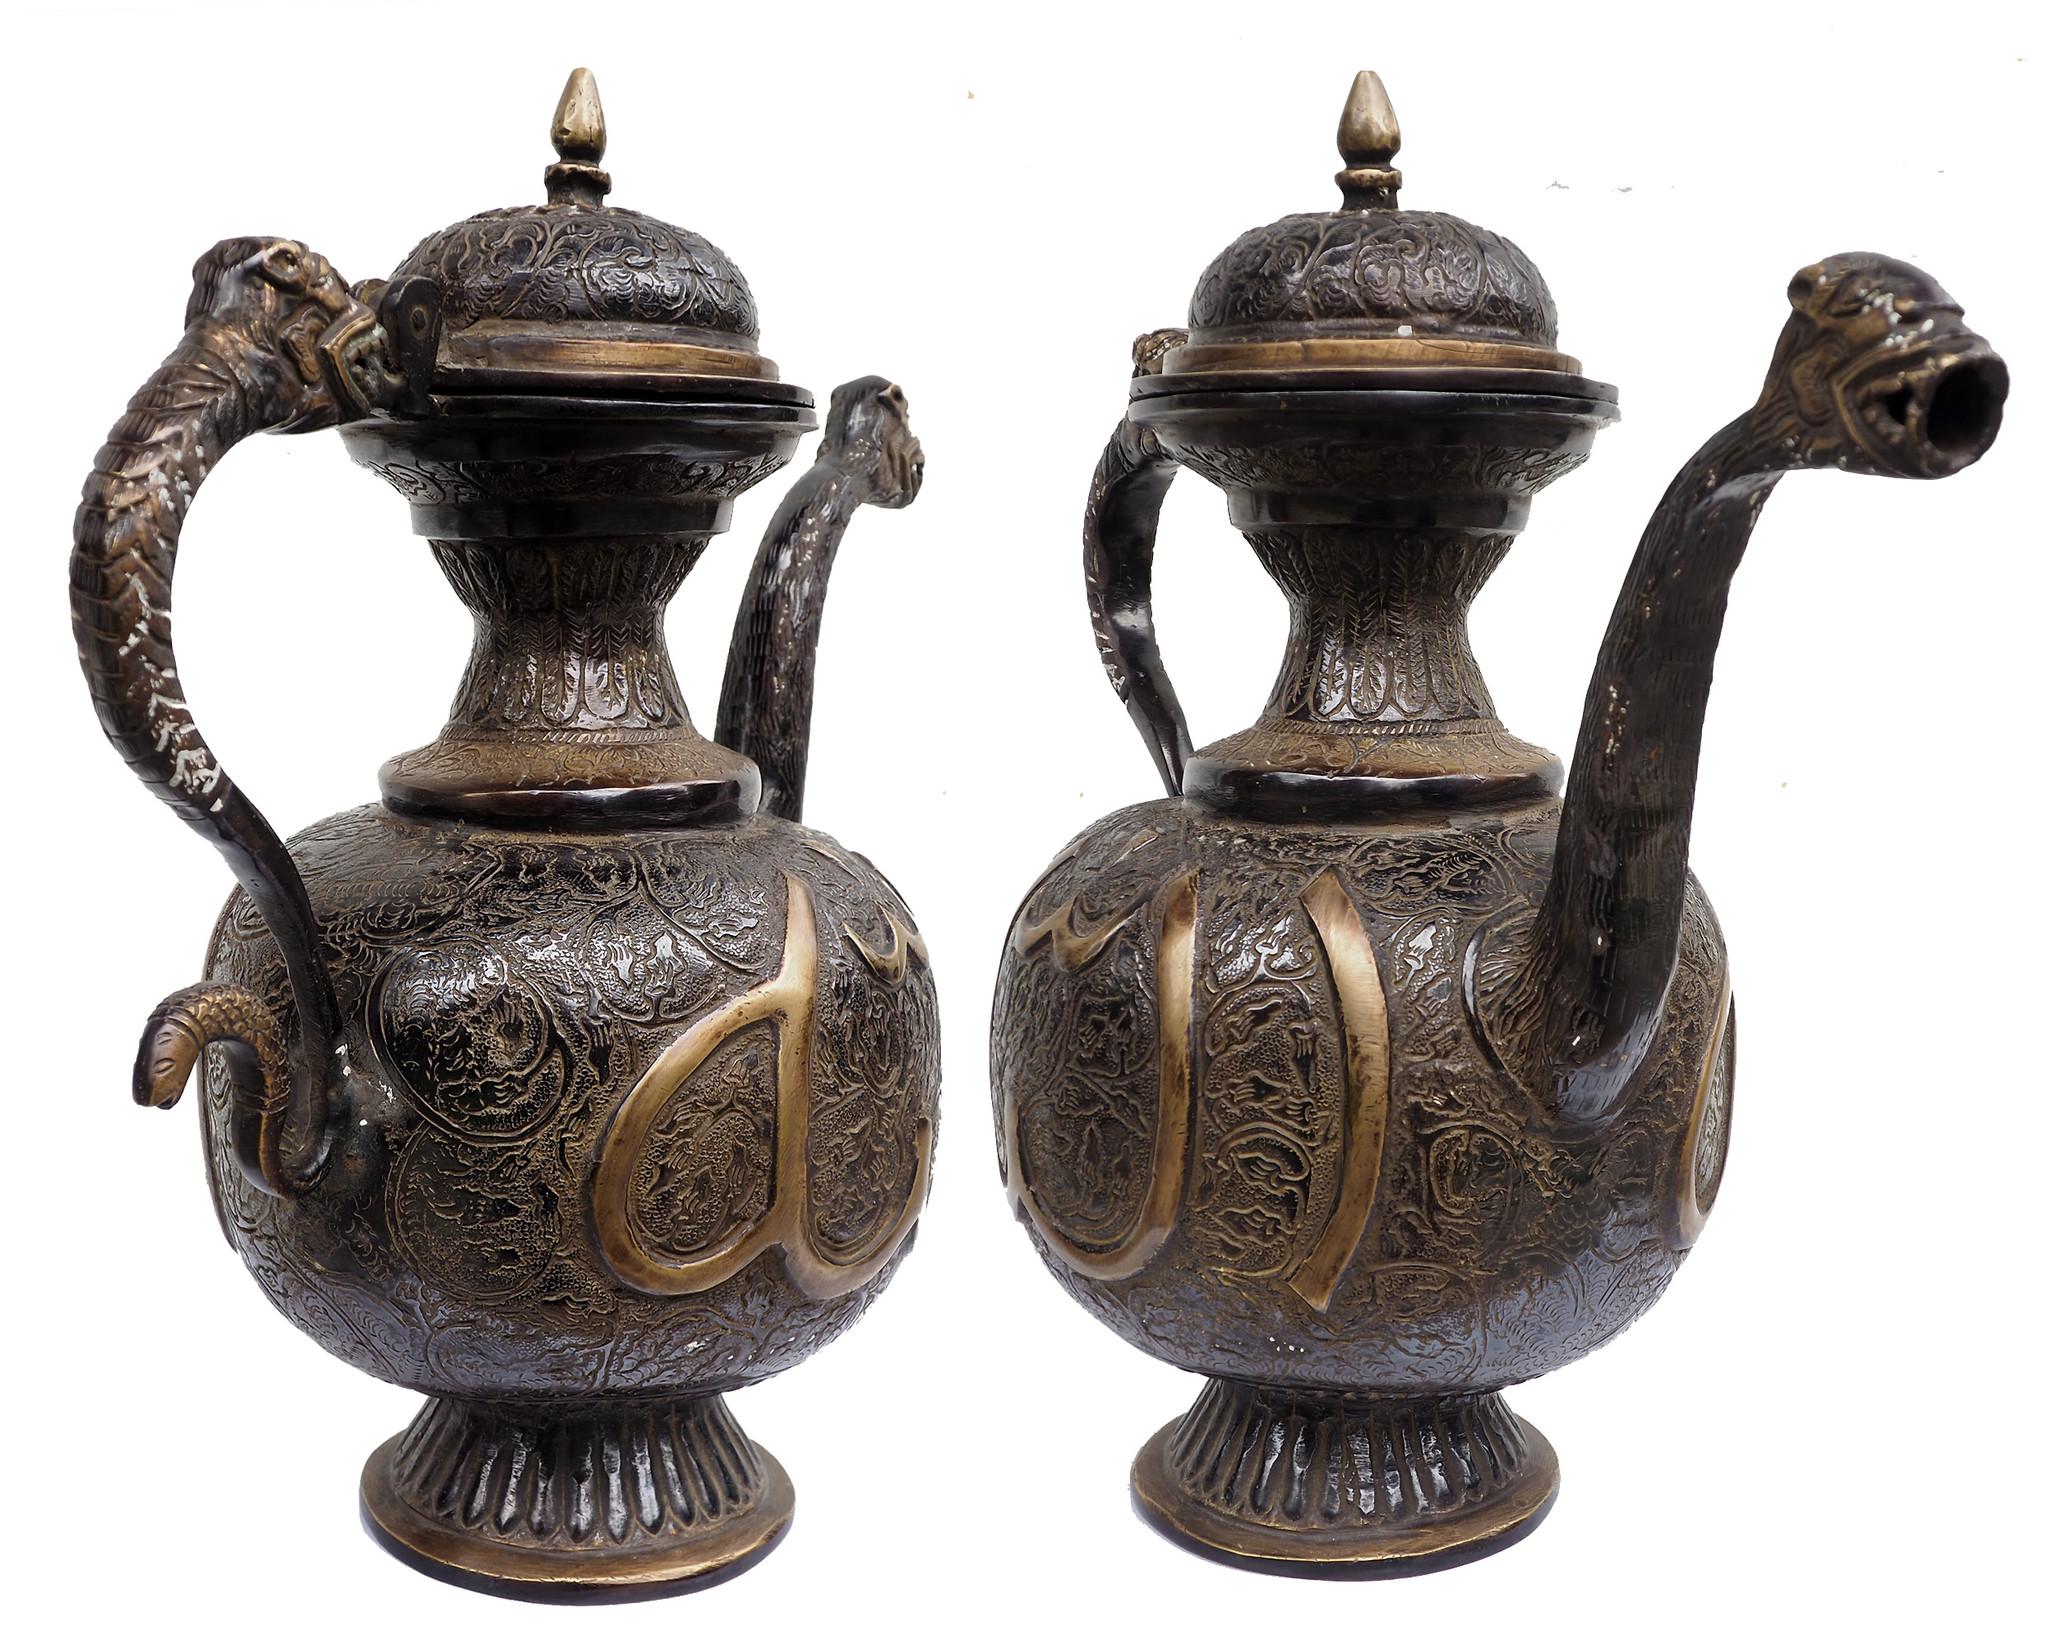 heavy islamic bronze  Ewer teapot  Aftaba North indian with Islamic Arabic script Alla (الله)